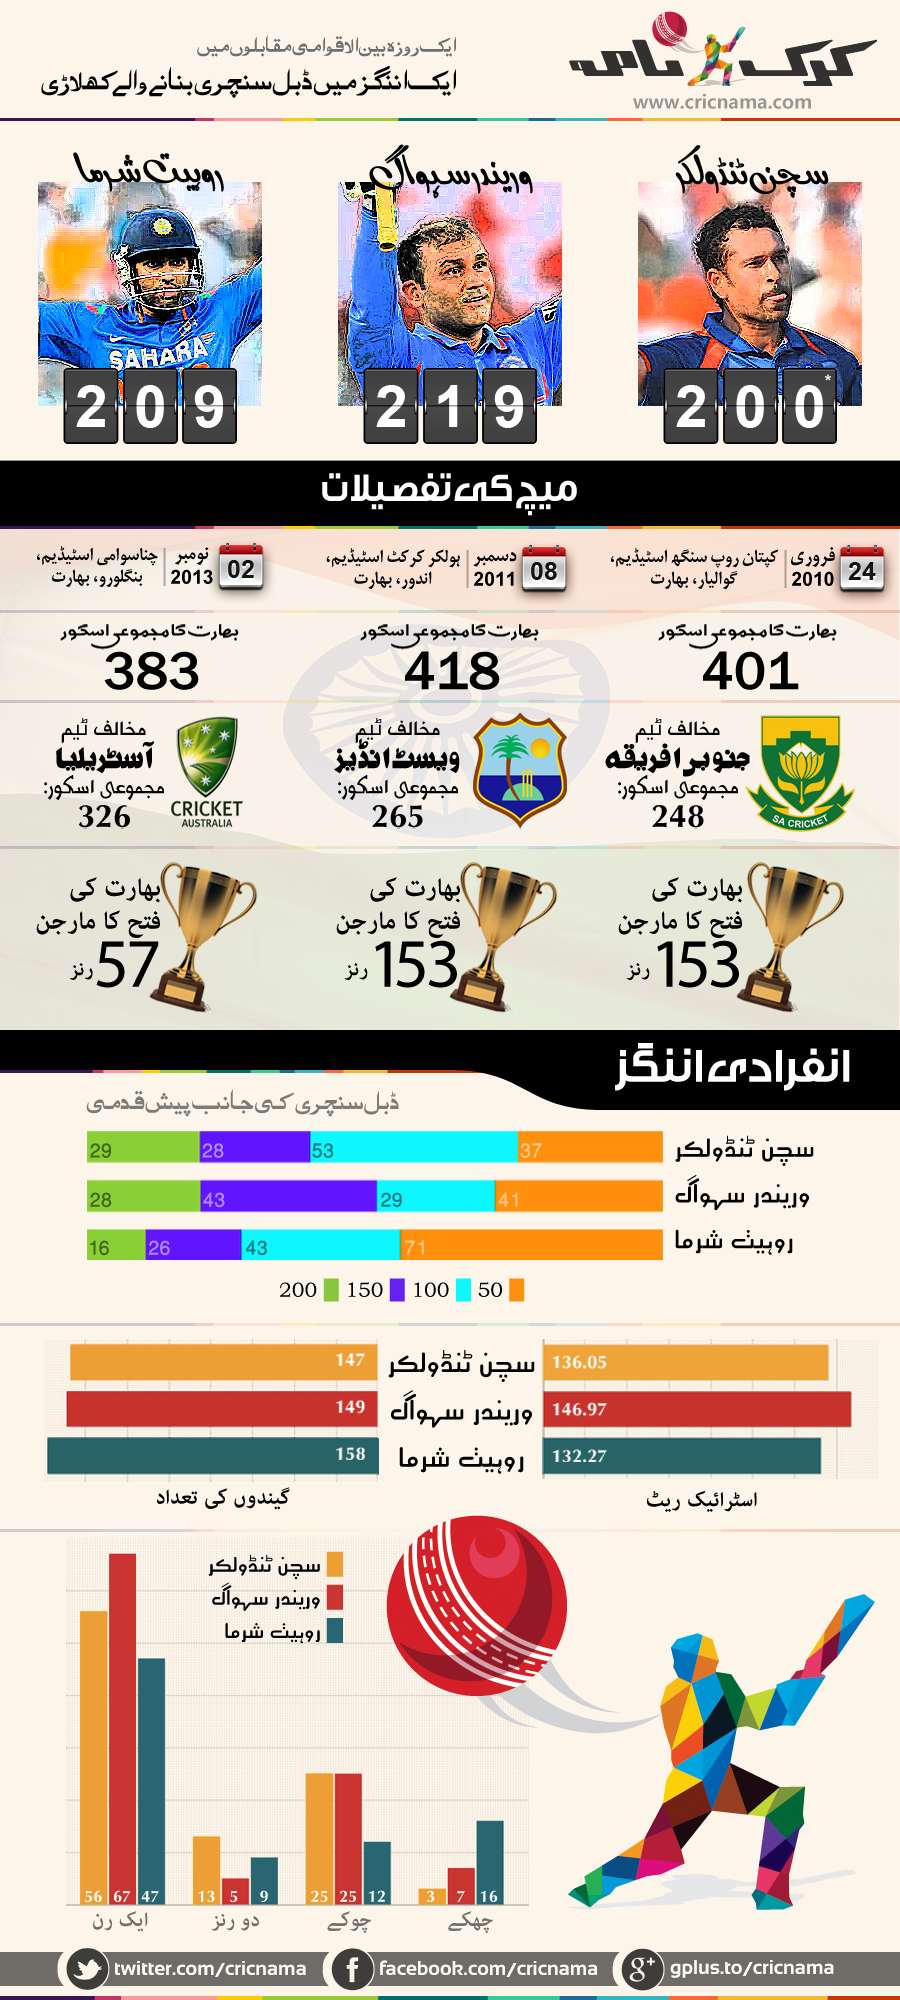 infographic-odi-double-centuries